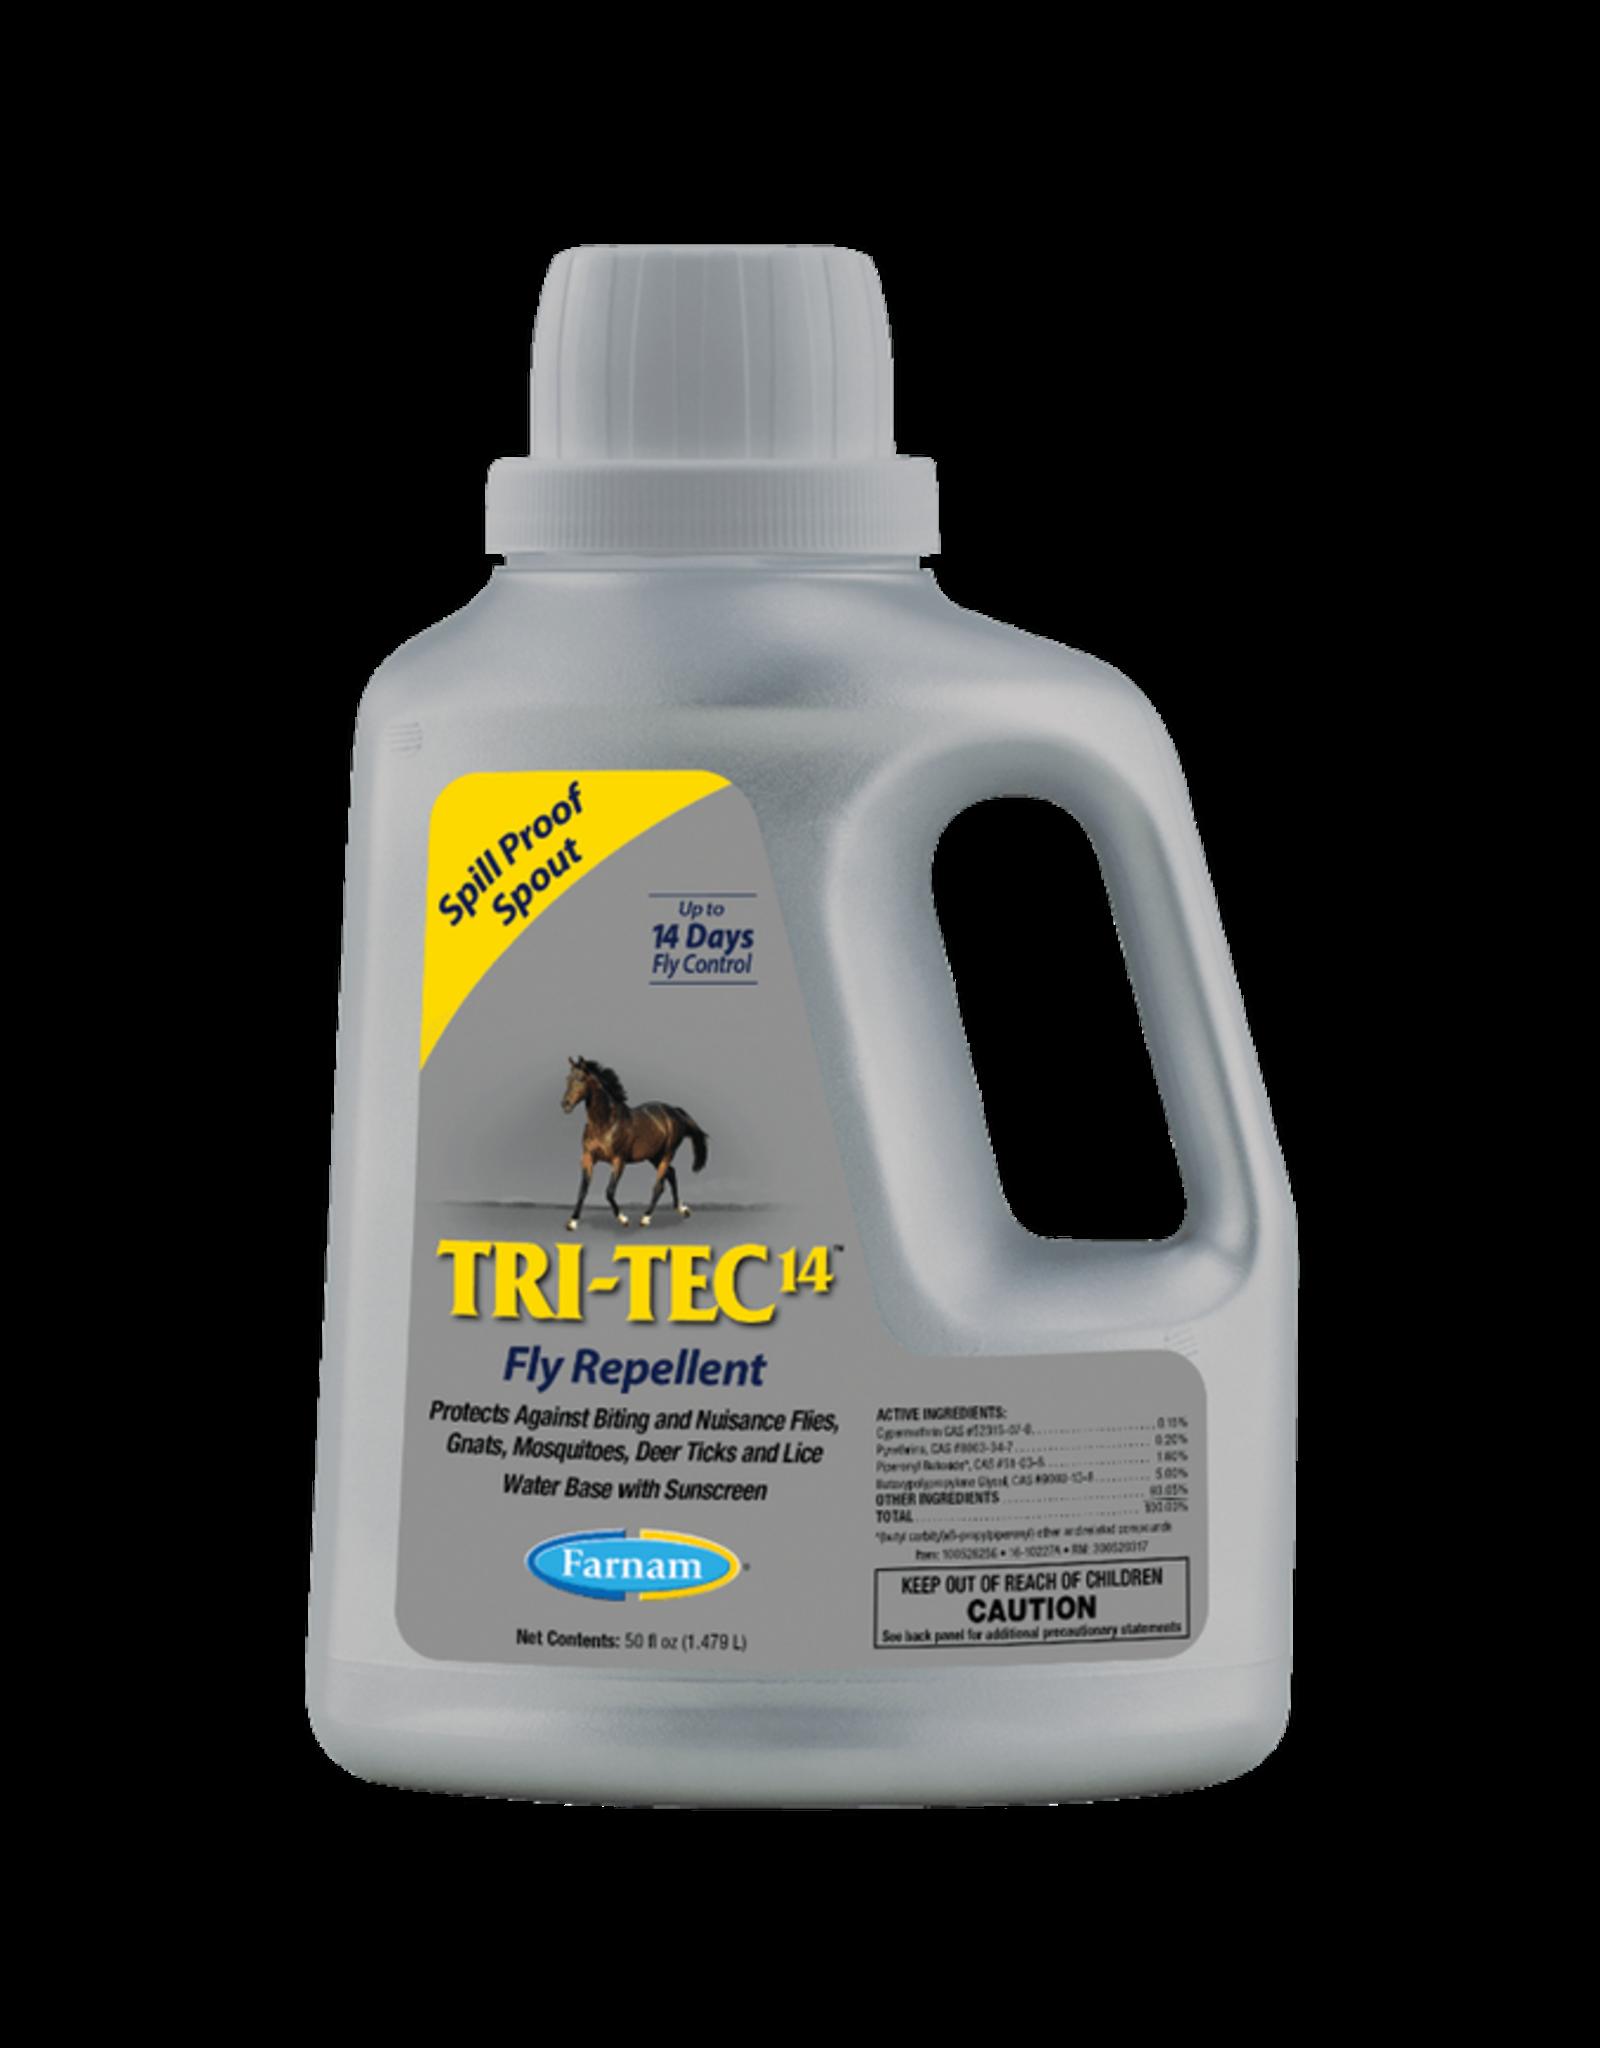 Farnam Tri-Tec 14 Fly Repellent - 50oz